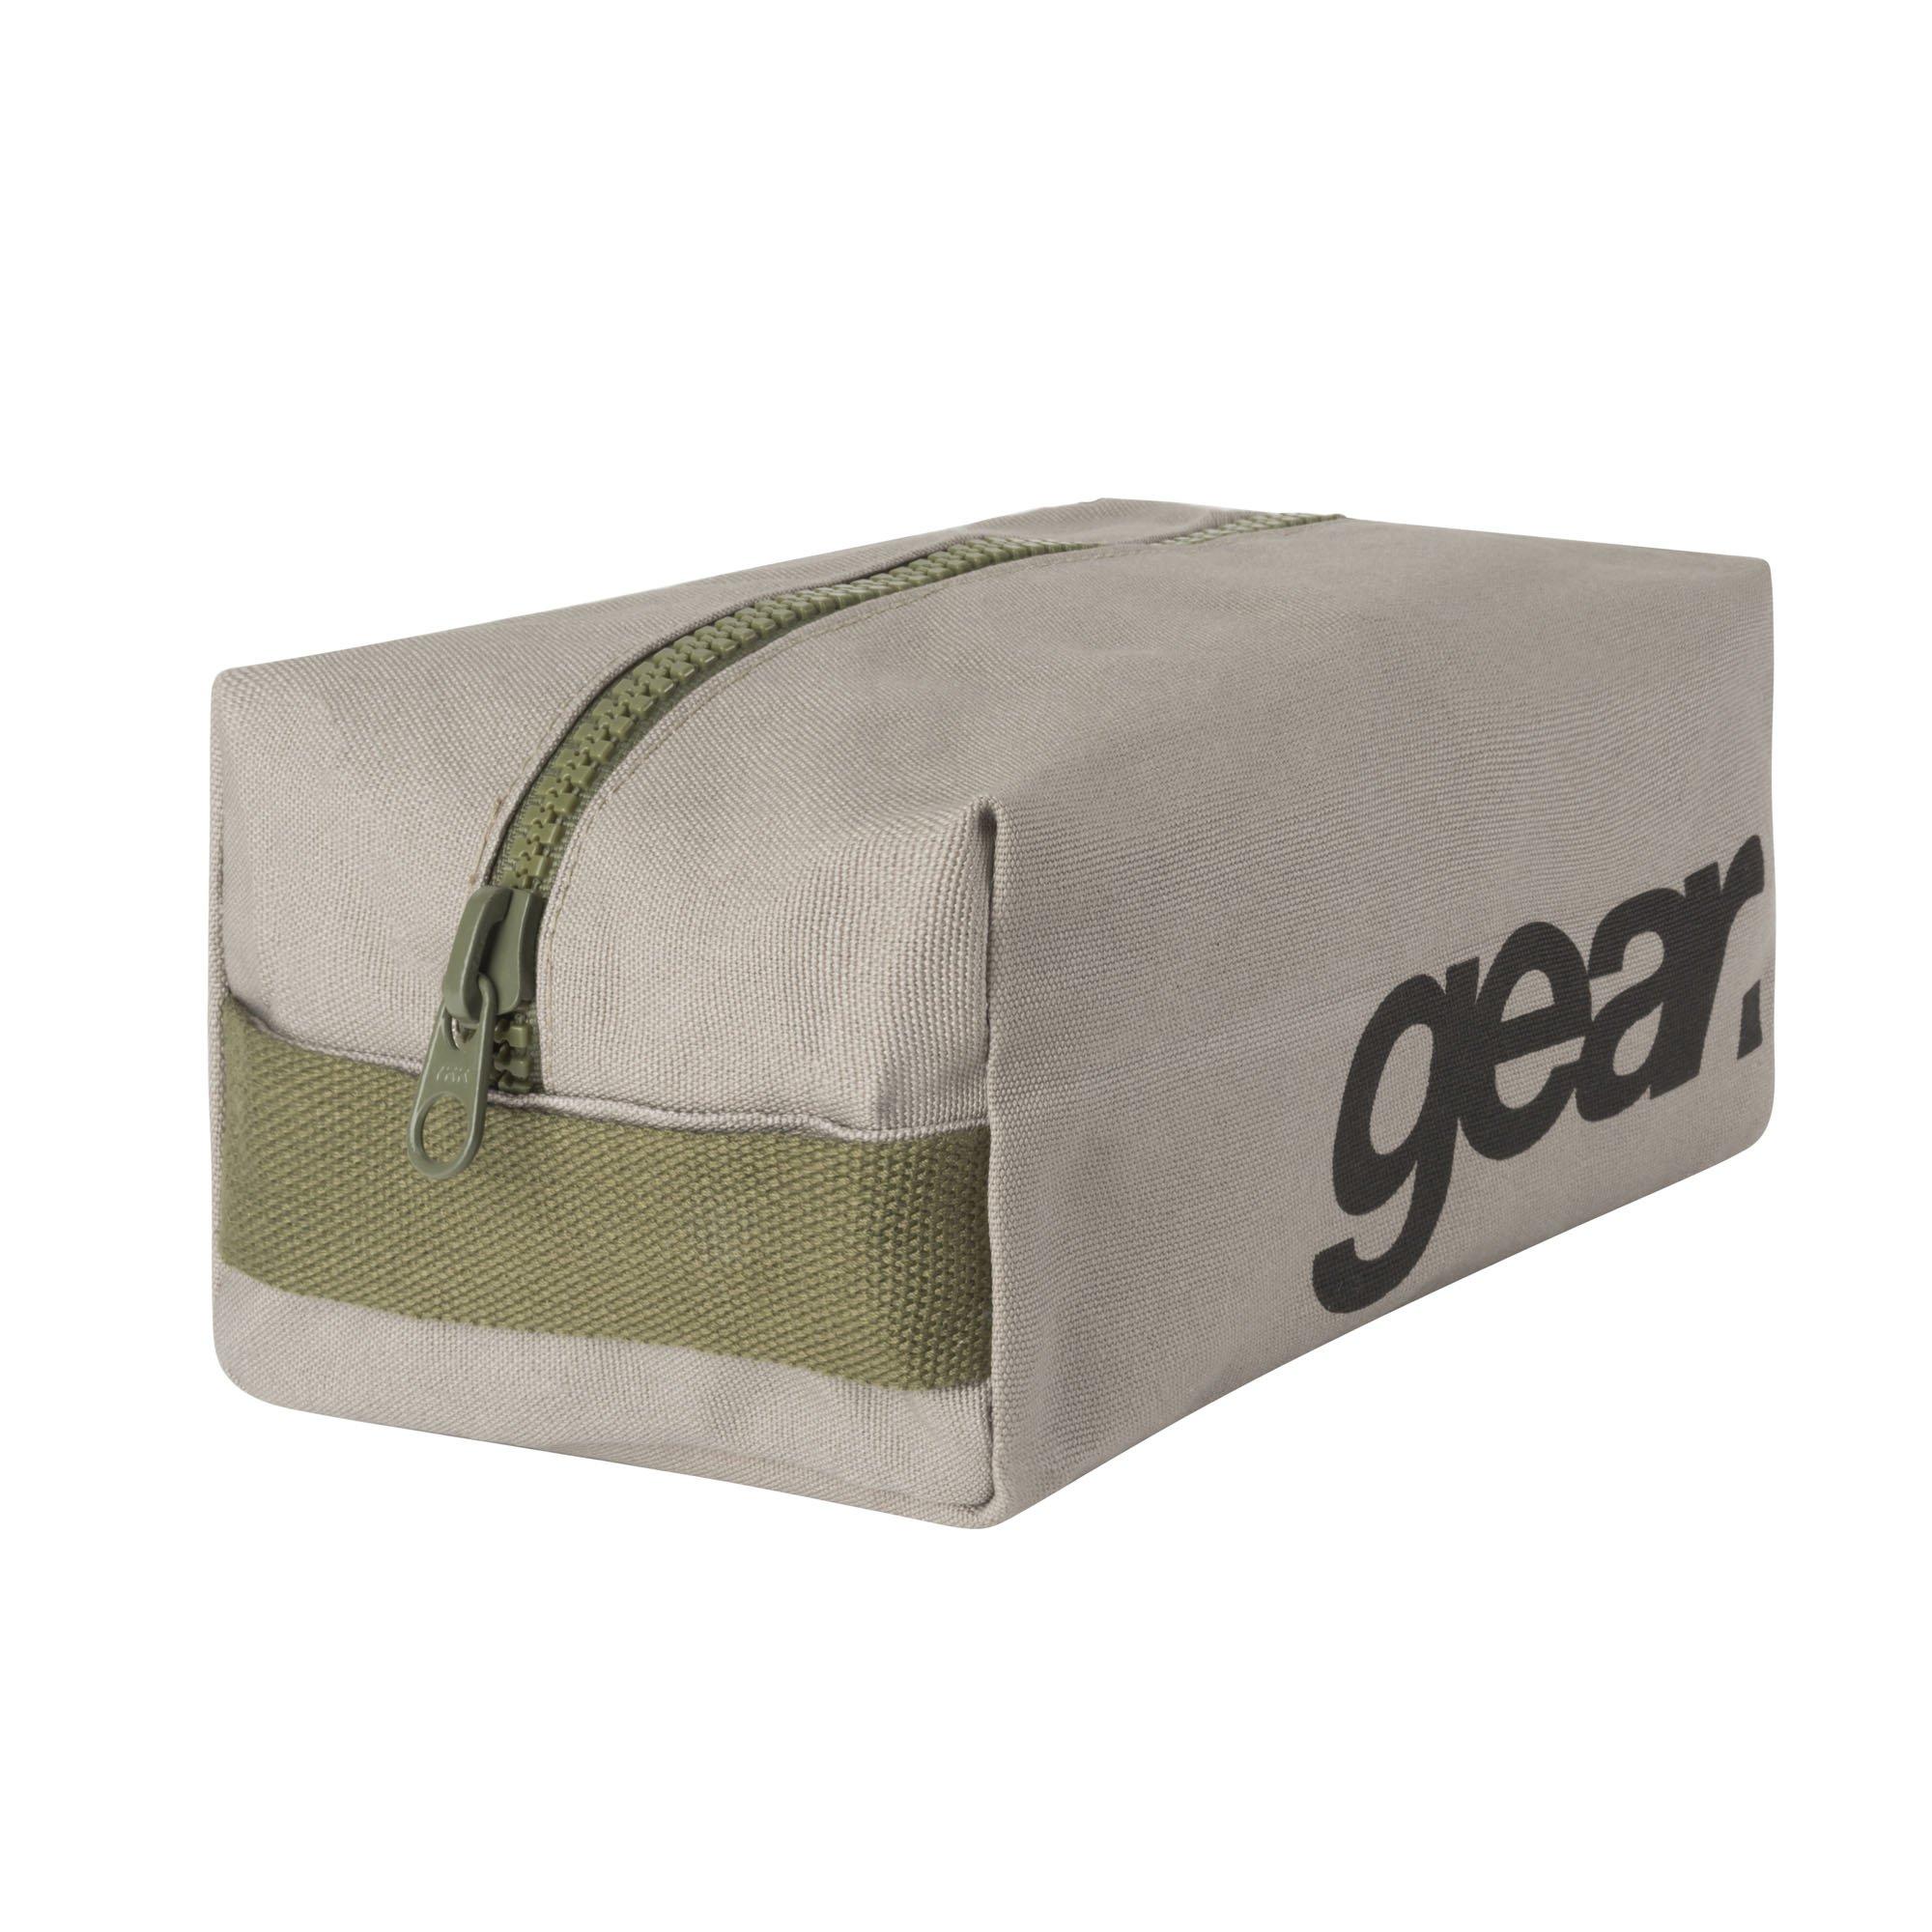 Fluf Traveller, Organic Cotton Toiletry Kit (Gear)